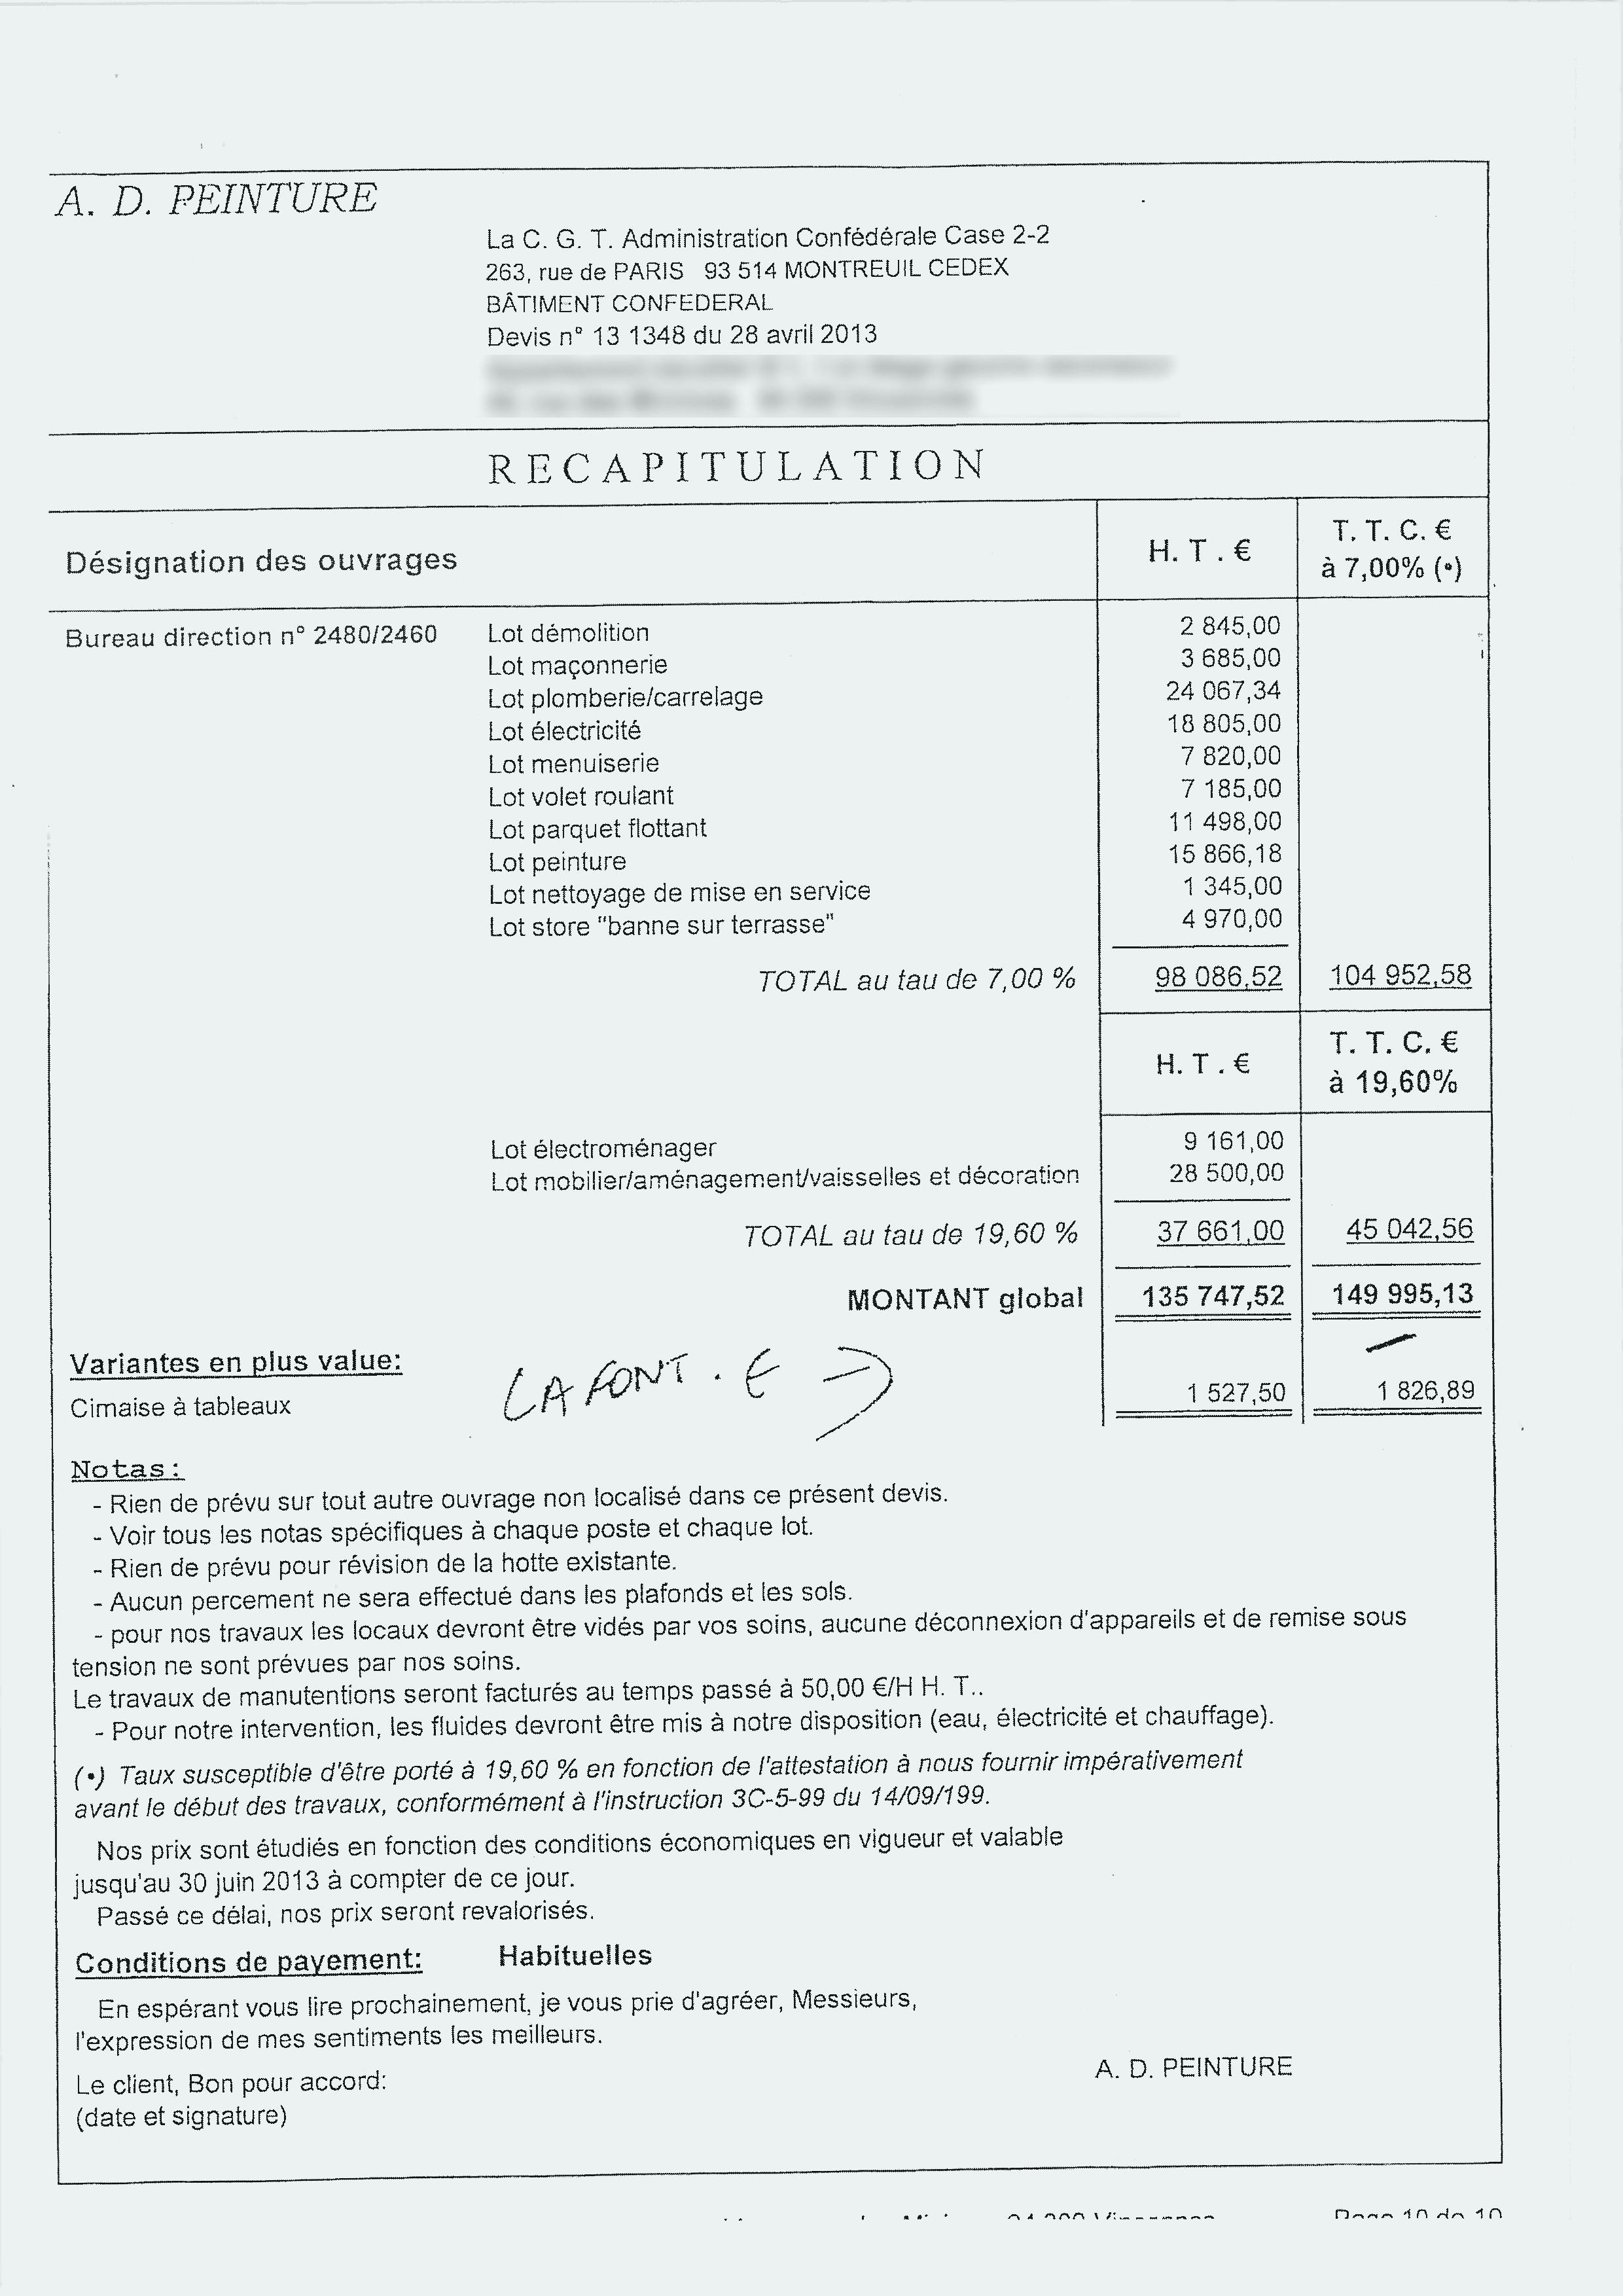 Devis Carrelage Leroy Merlin Inspirant Photos Devis Cuisine Leroy Merlin Le Luxe élégant Devis Carrelage